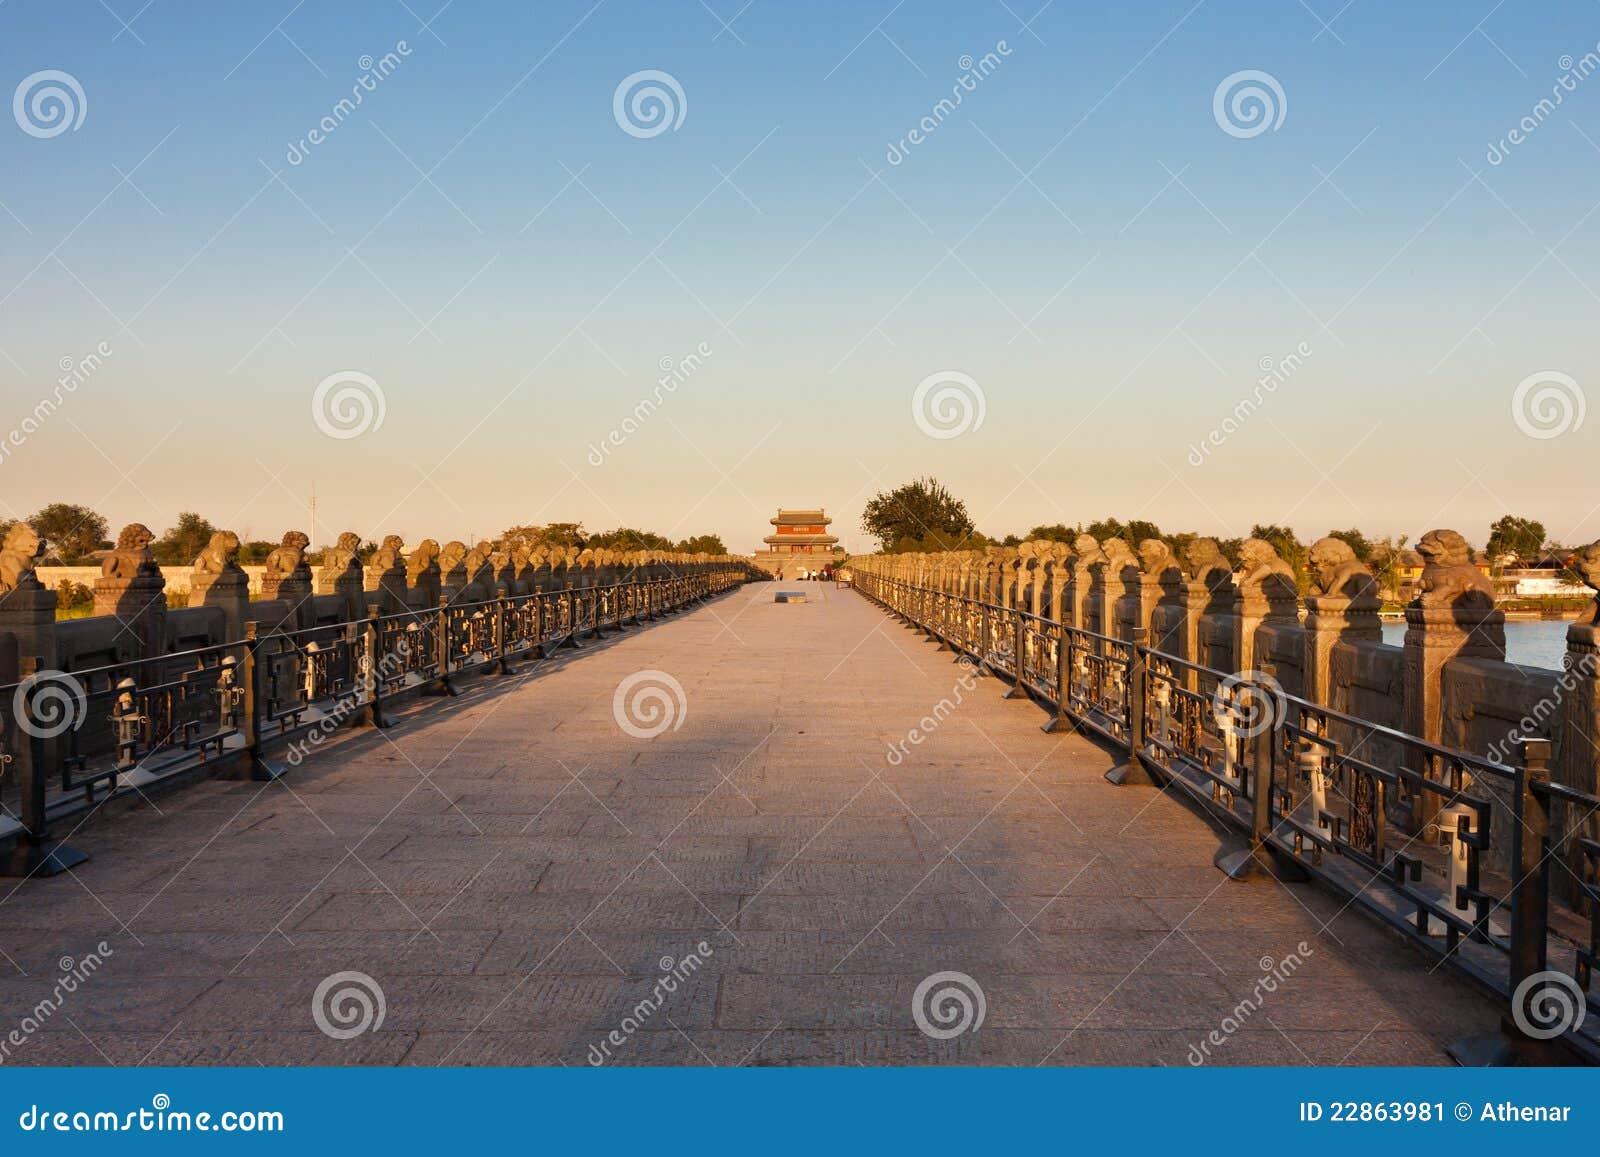 oude brug lugou de brug van marco polo peking stock afbeelding afbeelding bestaande uit park. Black Bedroom Furniture Sets. Home Design Ideas